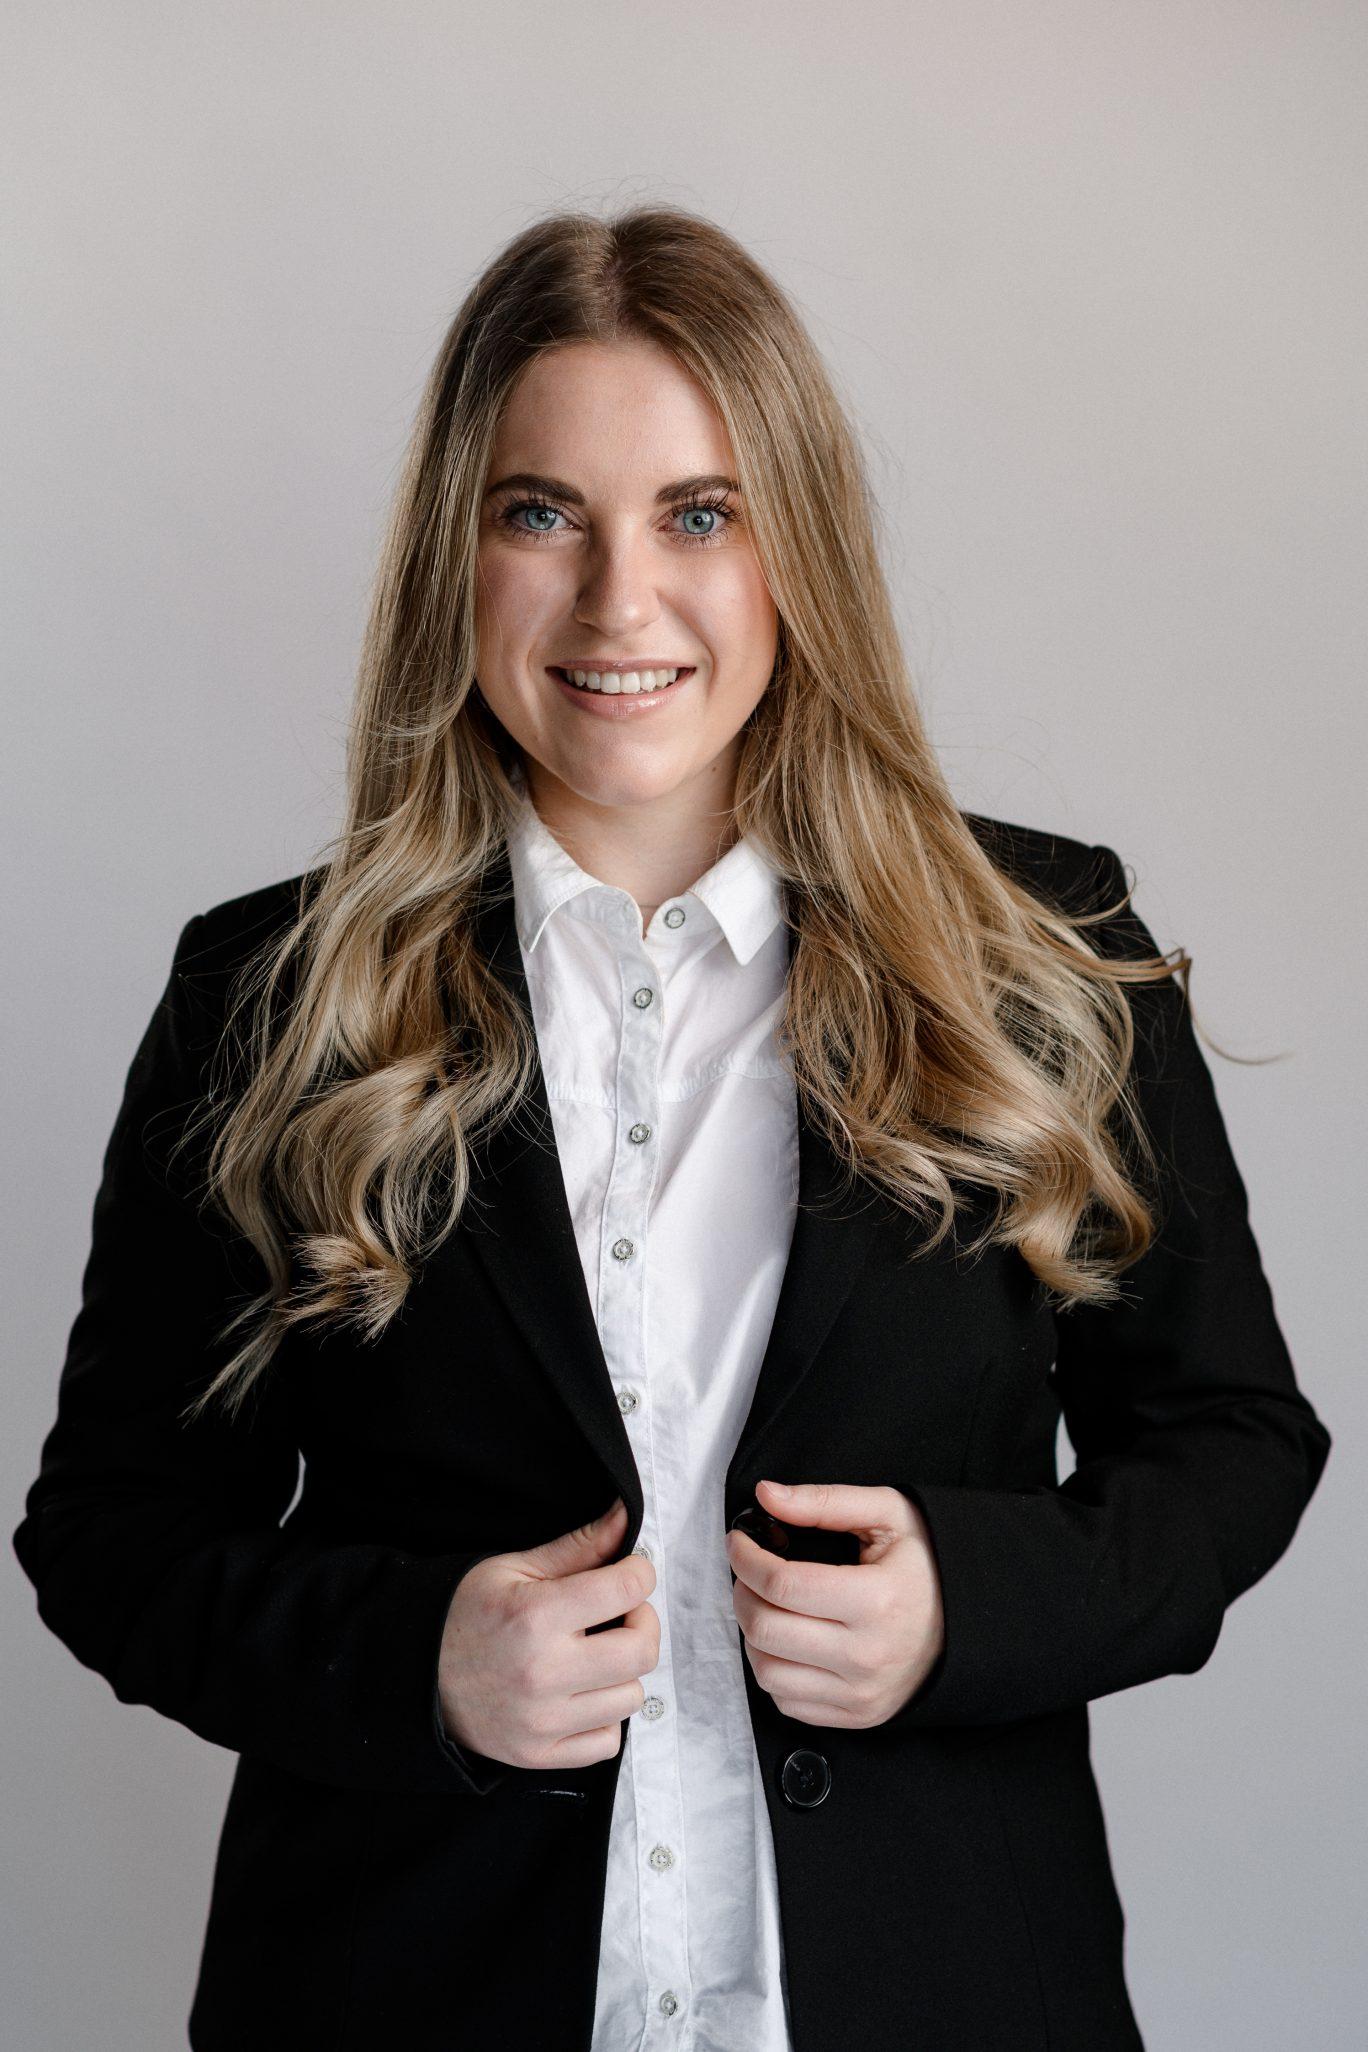 Melanie Maier